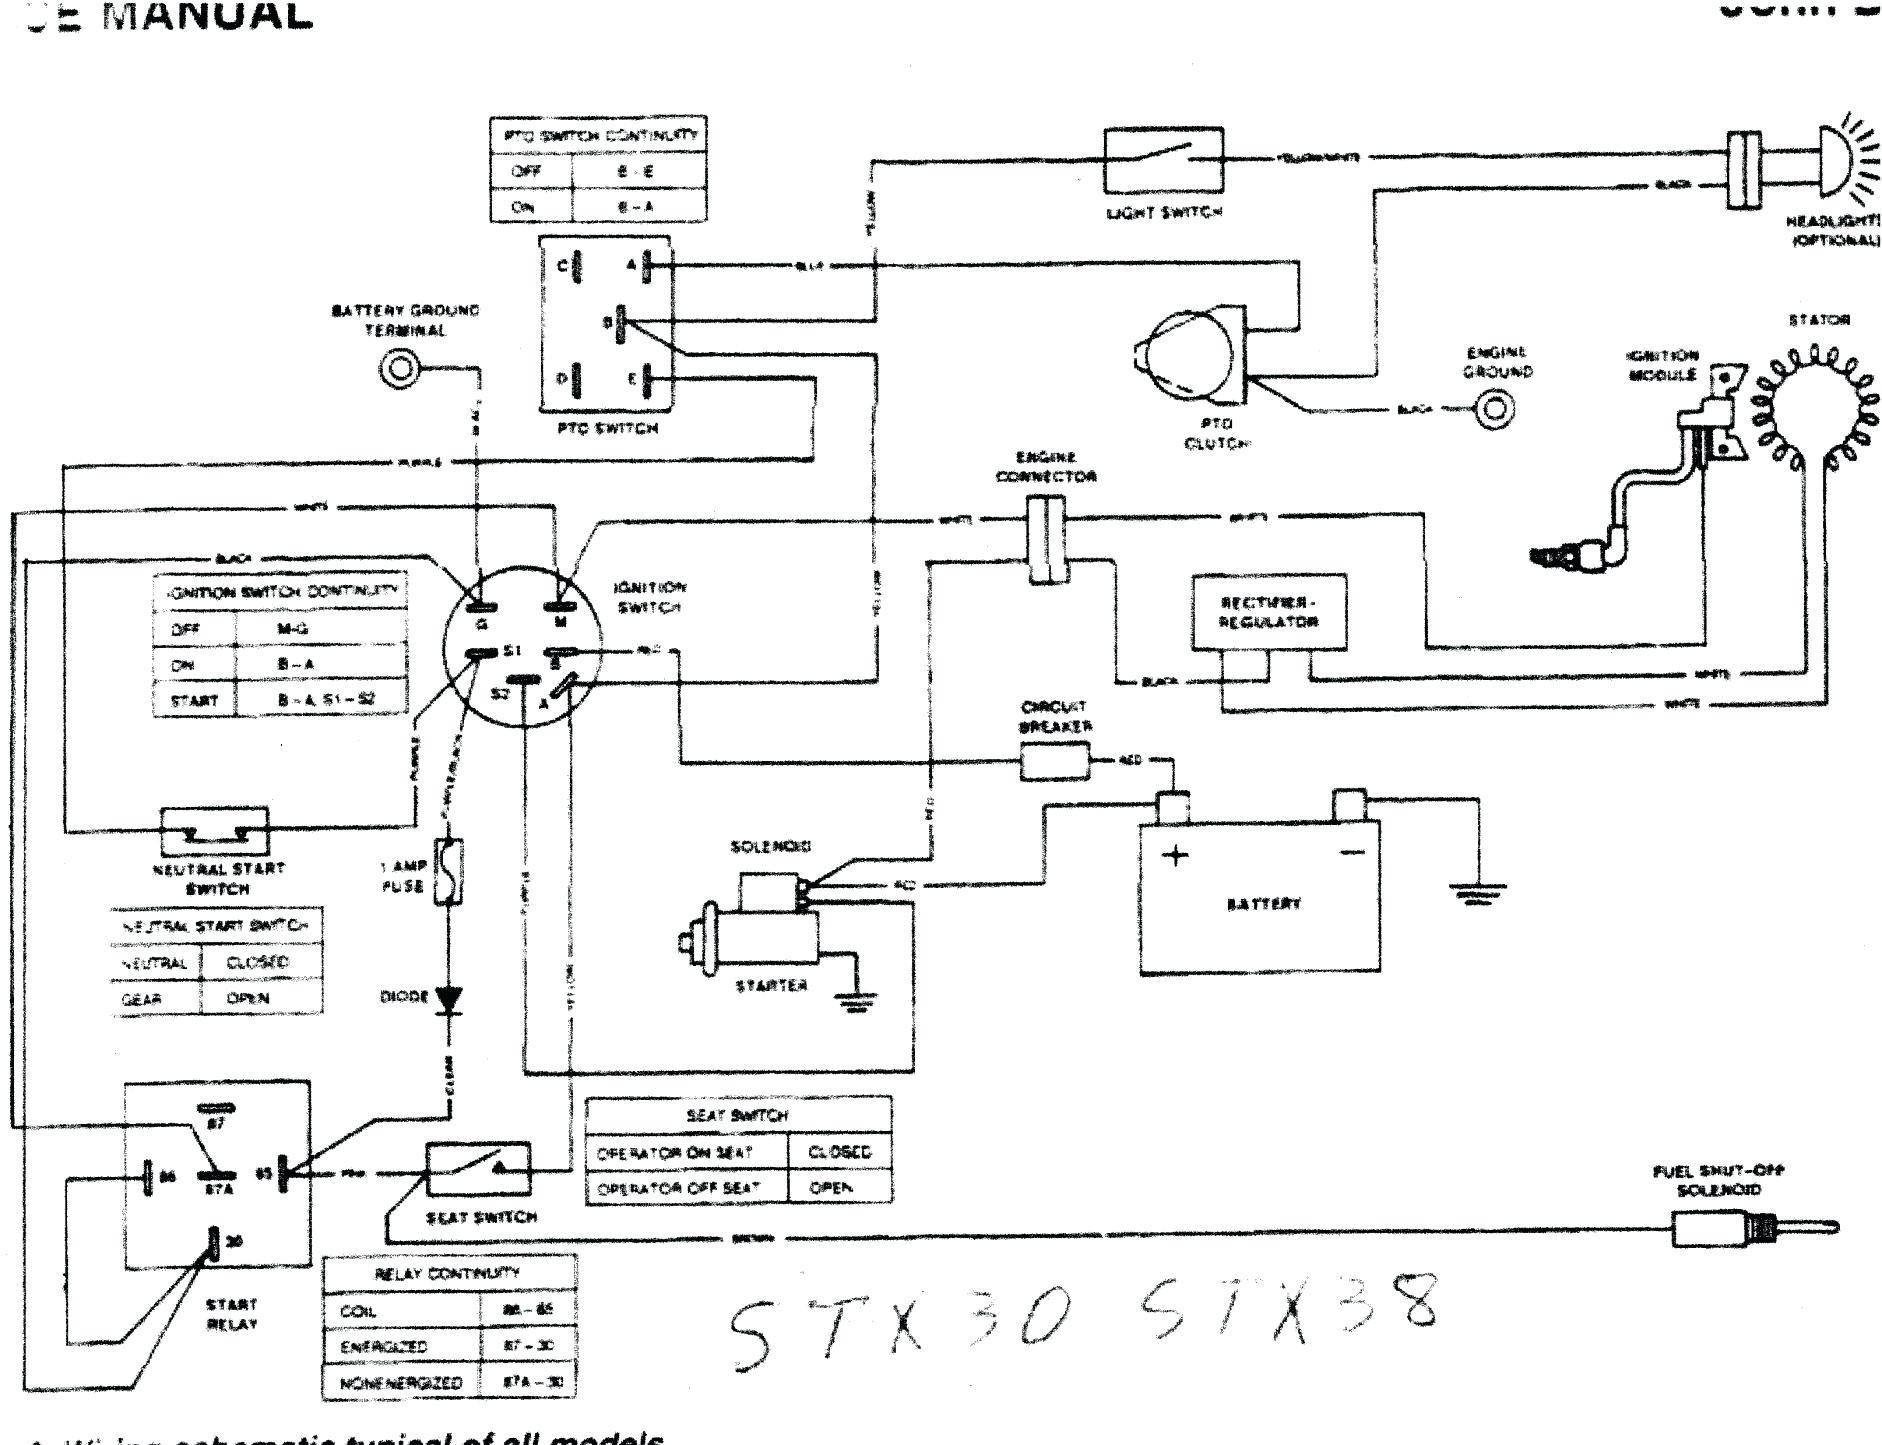 John Deere Electrical Schematic John Deere L110 Wiring Schematic Wiring Diagram